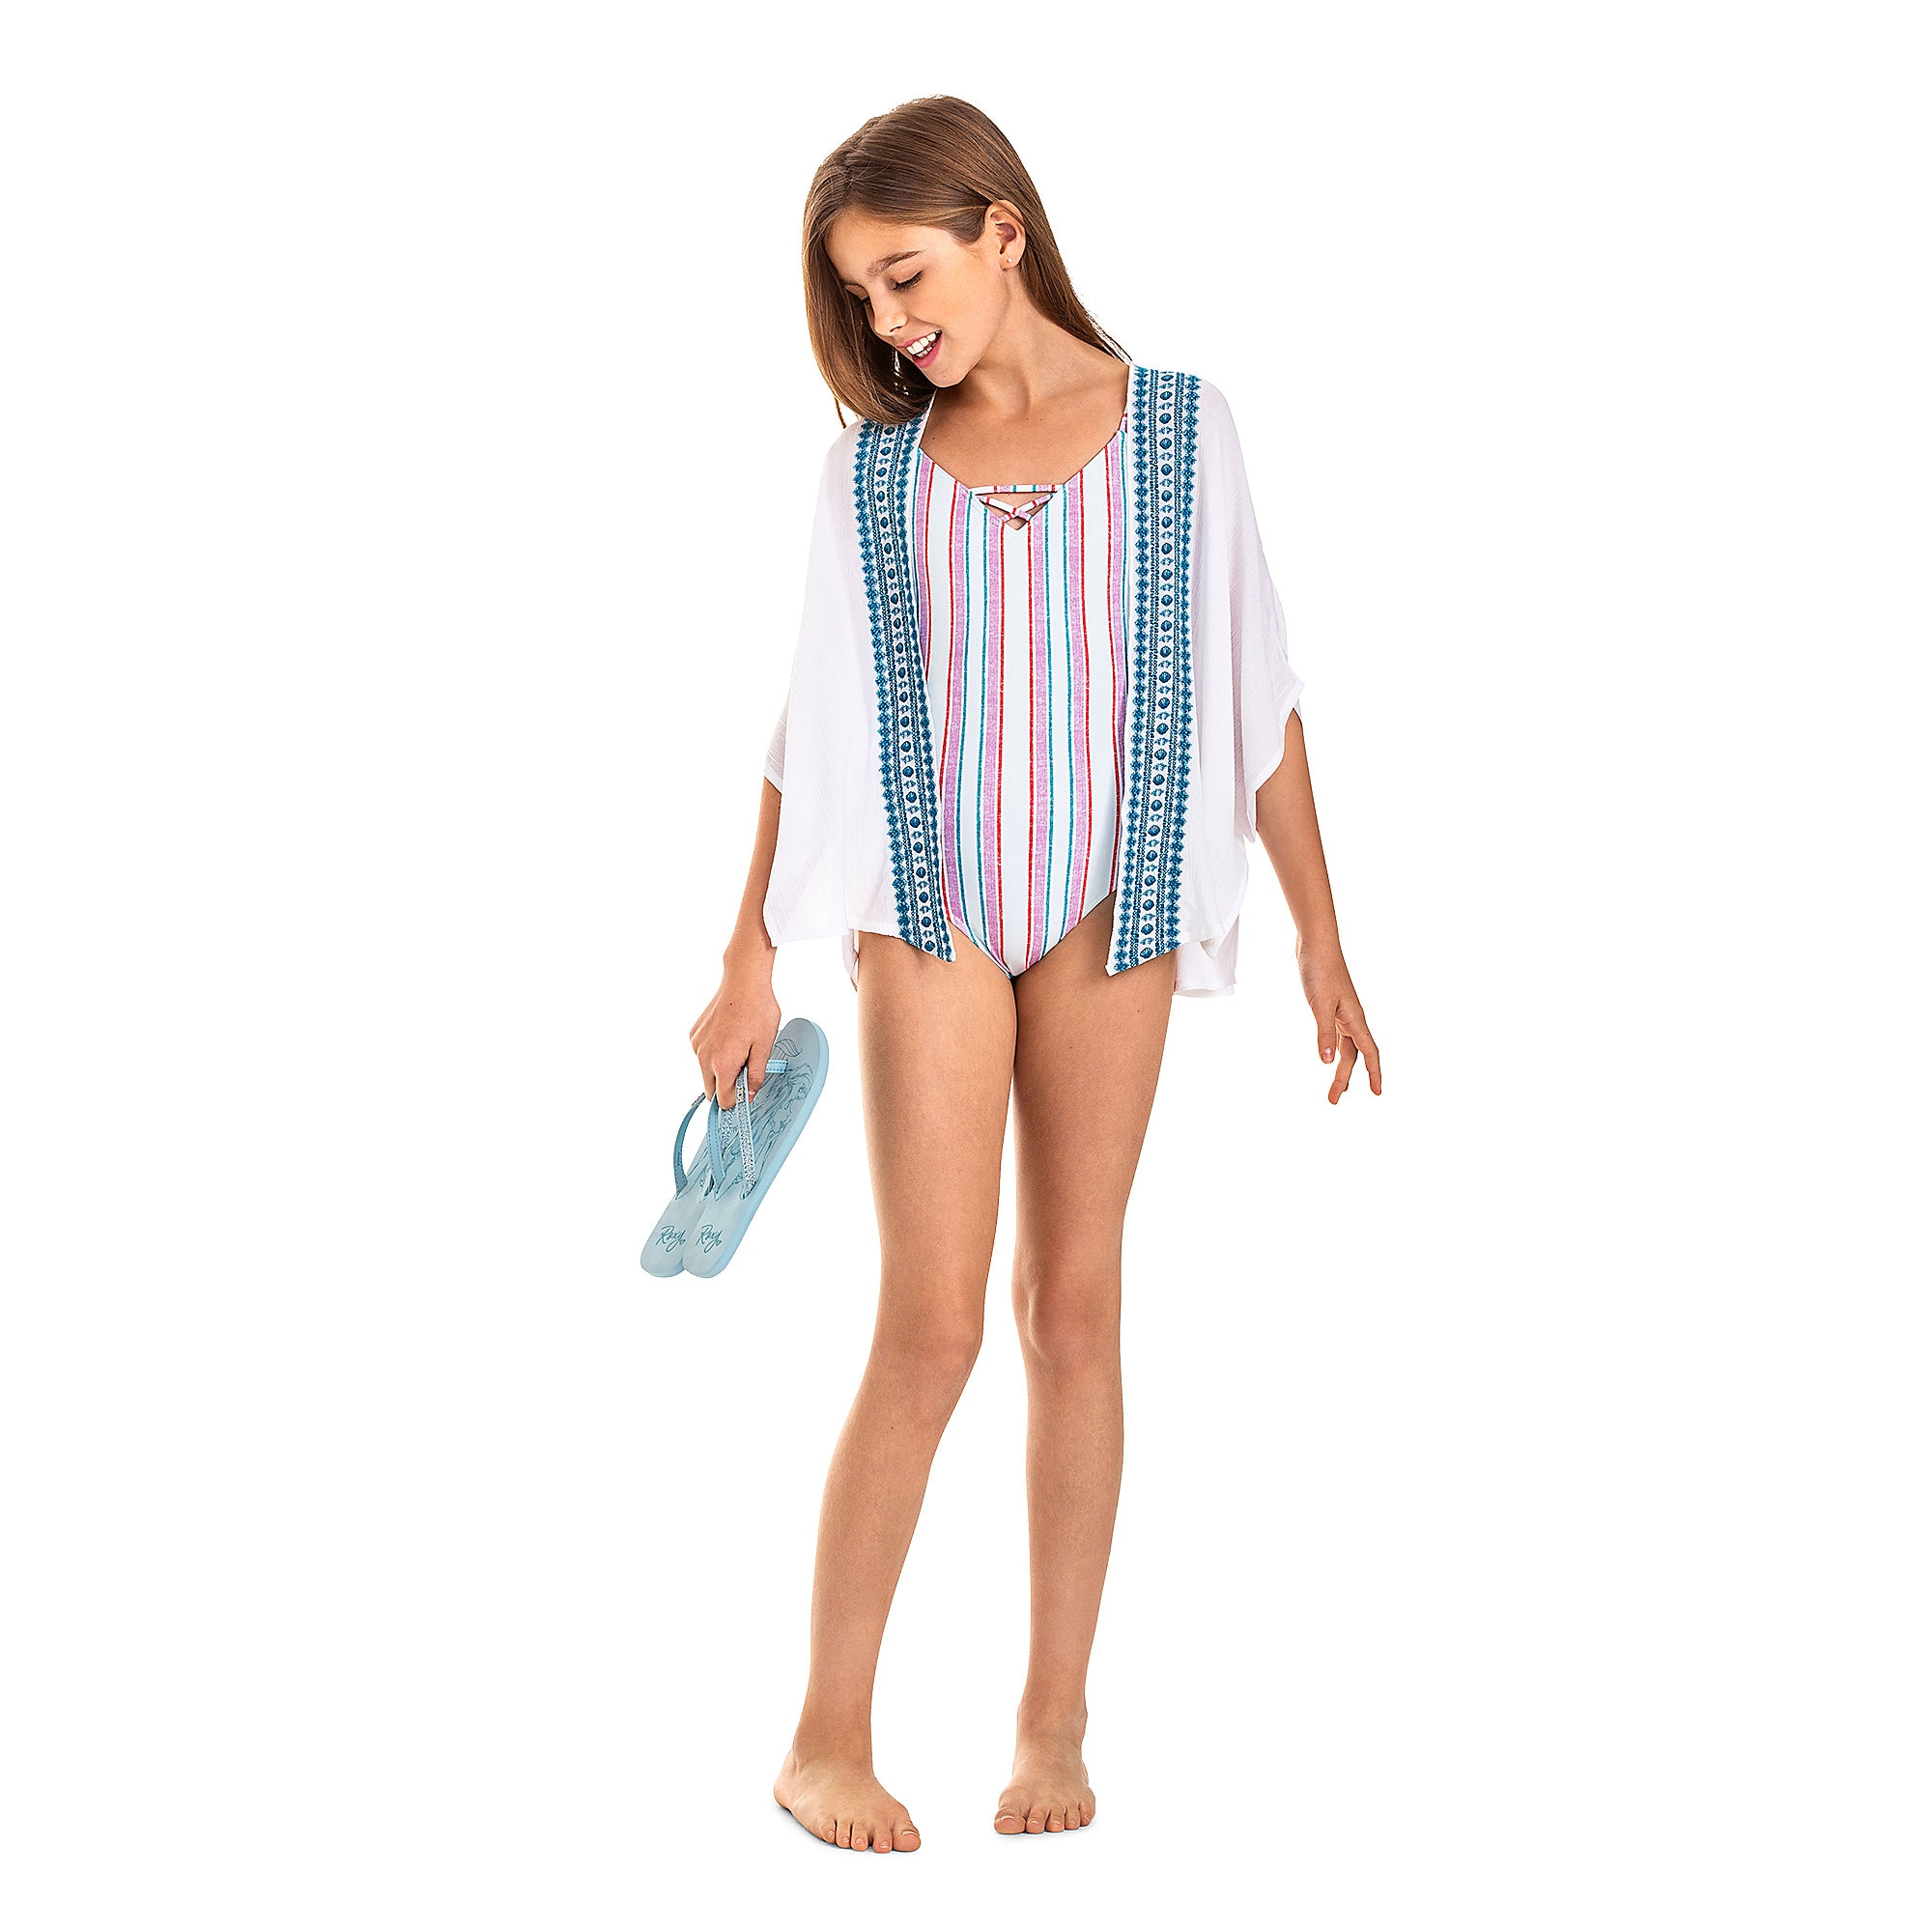 The Little Mermaid Kimono for Girls by ROXY Girl